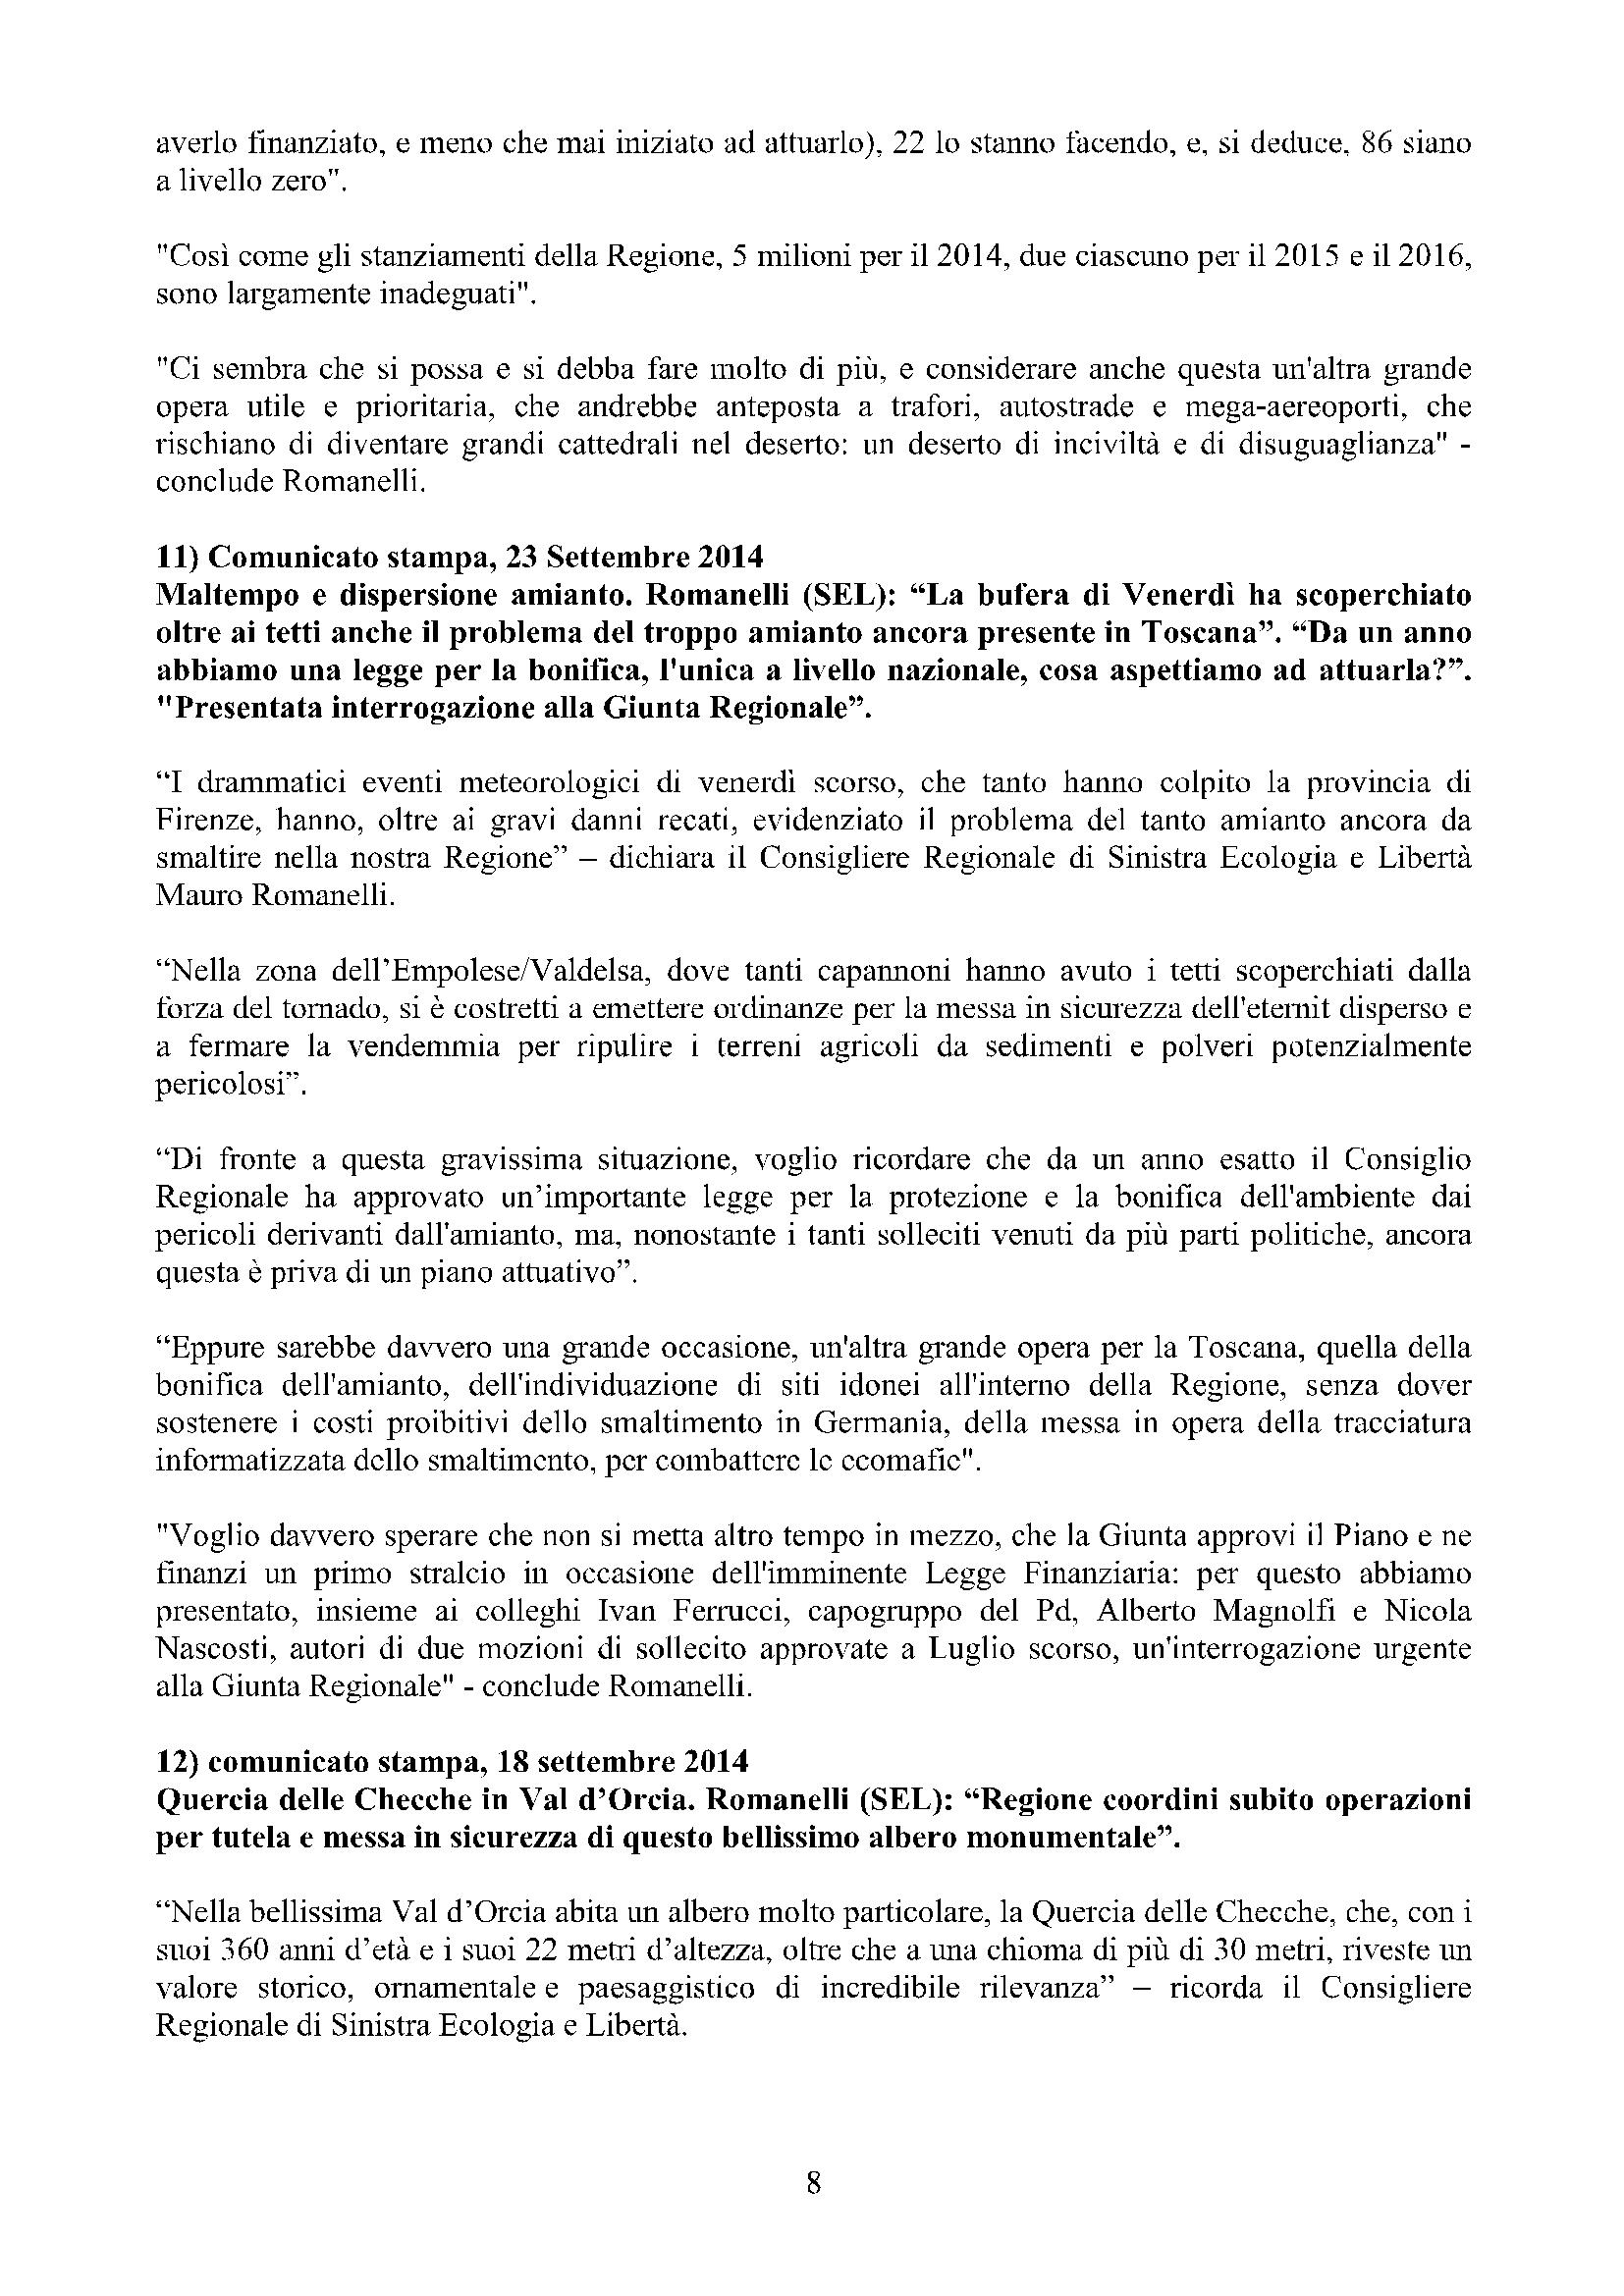 Newsletter di MAURO ROMANELLI Ottobre 2014 -8